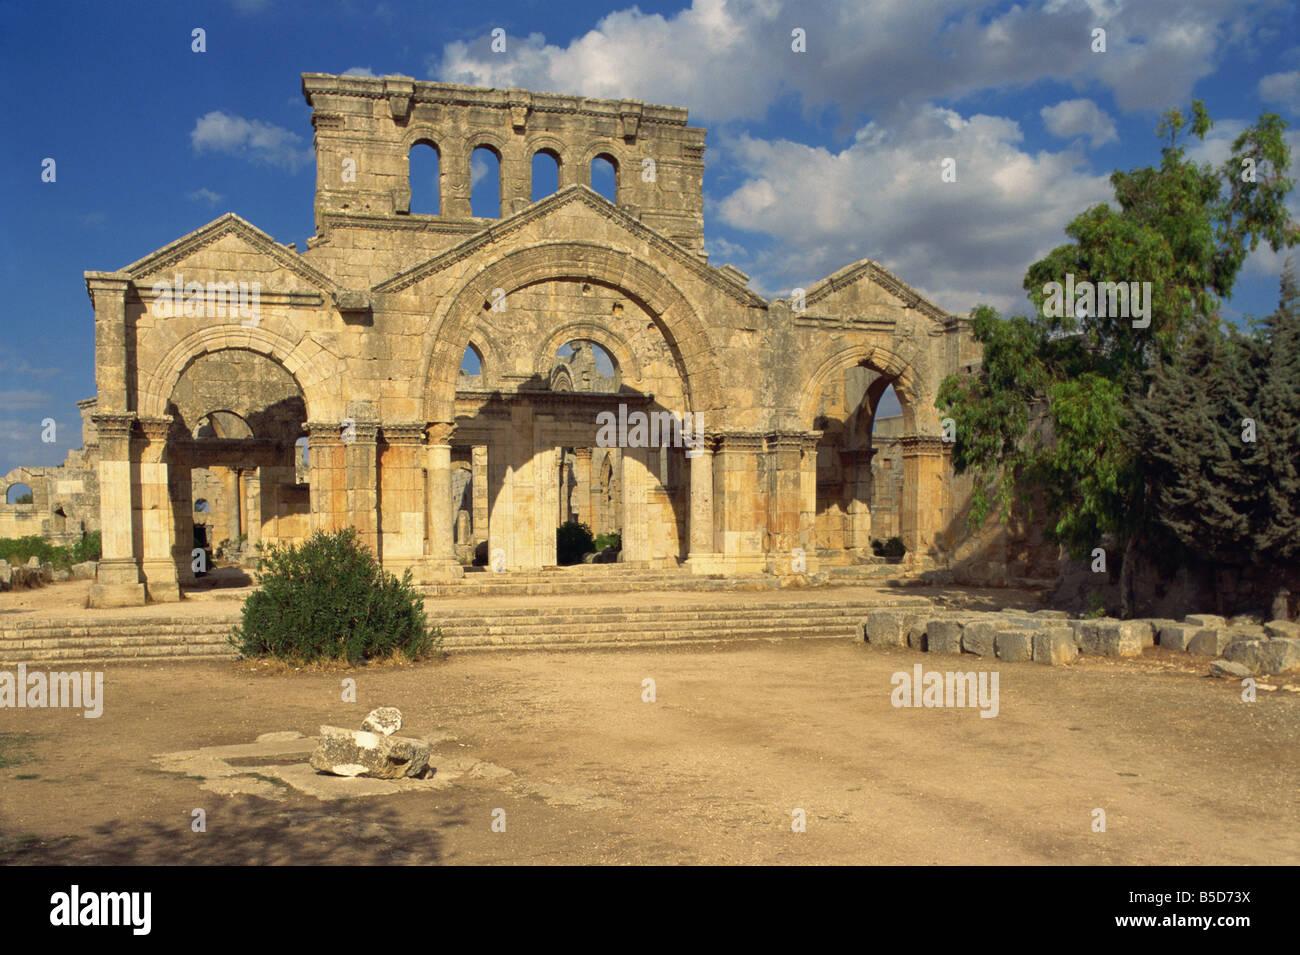 Basilica of San Simeon (Qala'at Samaan), Syria, Middle East - Stock Image